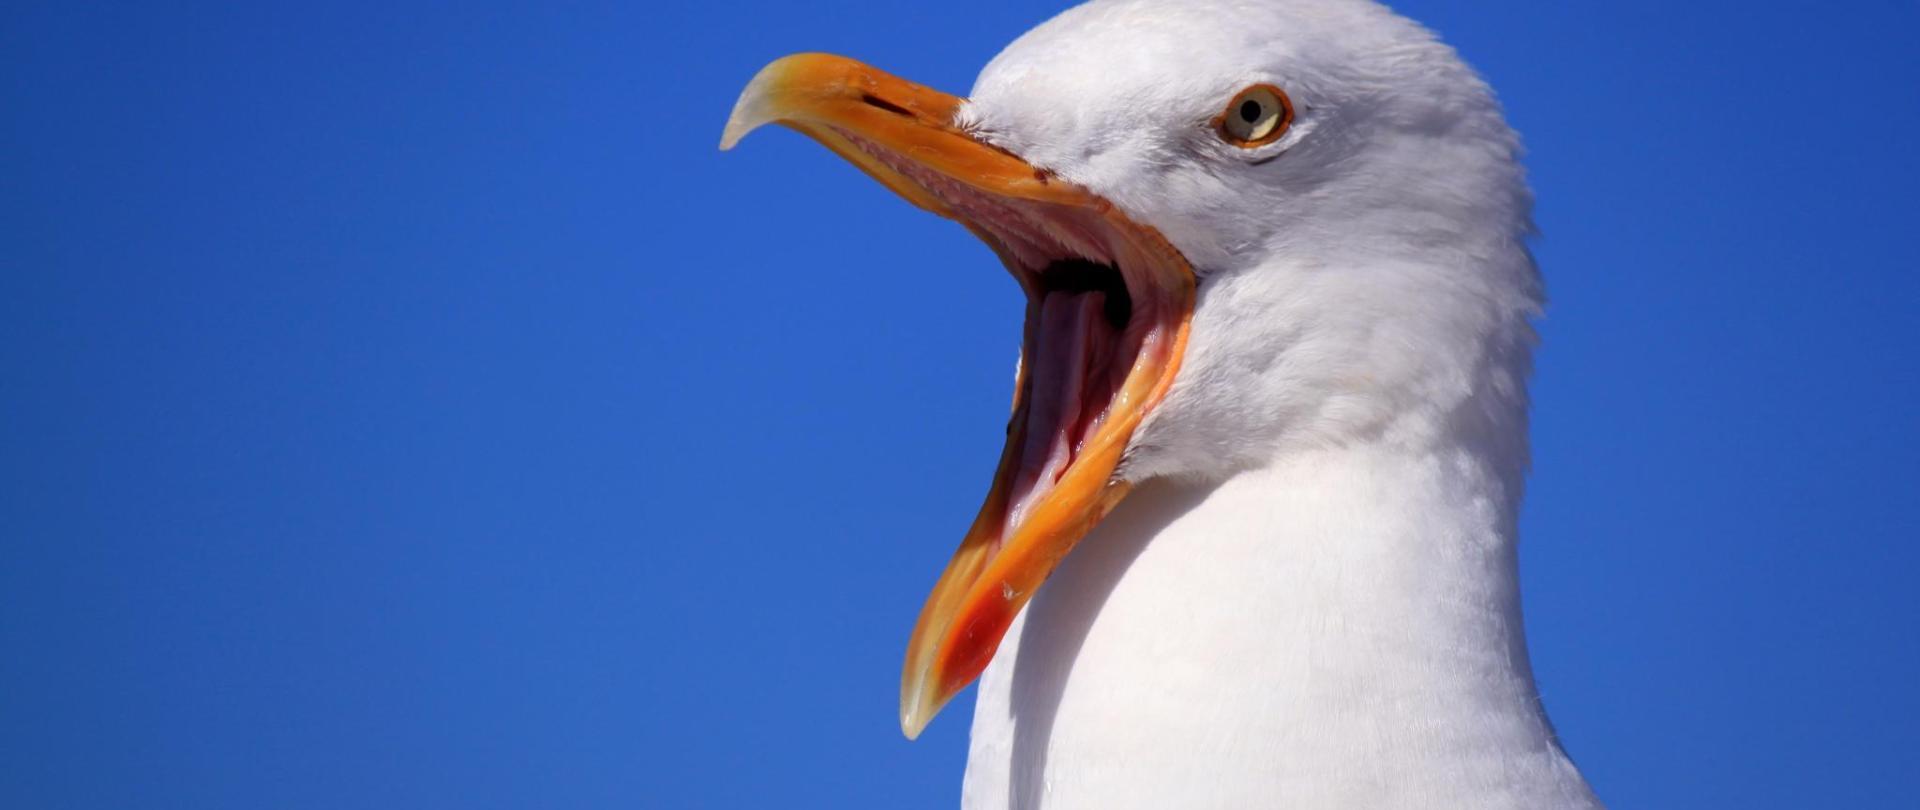 seagull-249638.jpg